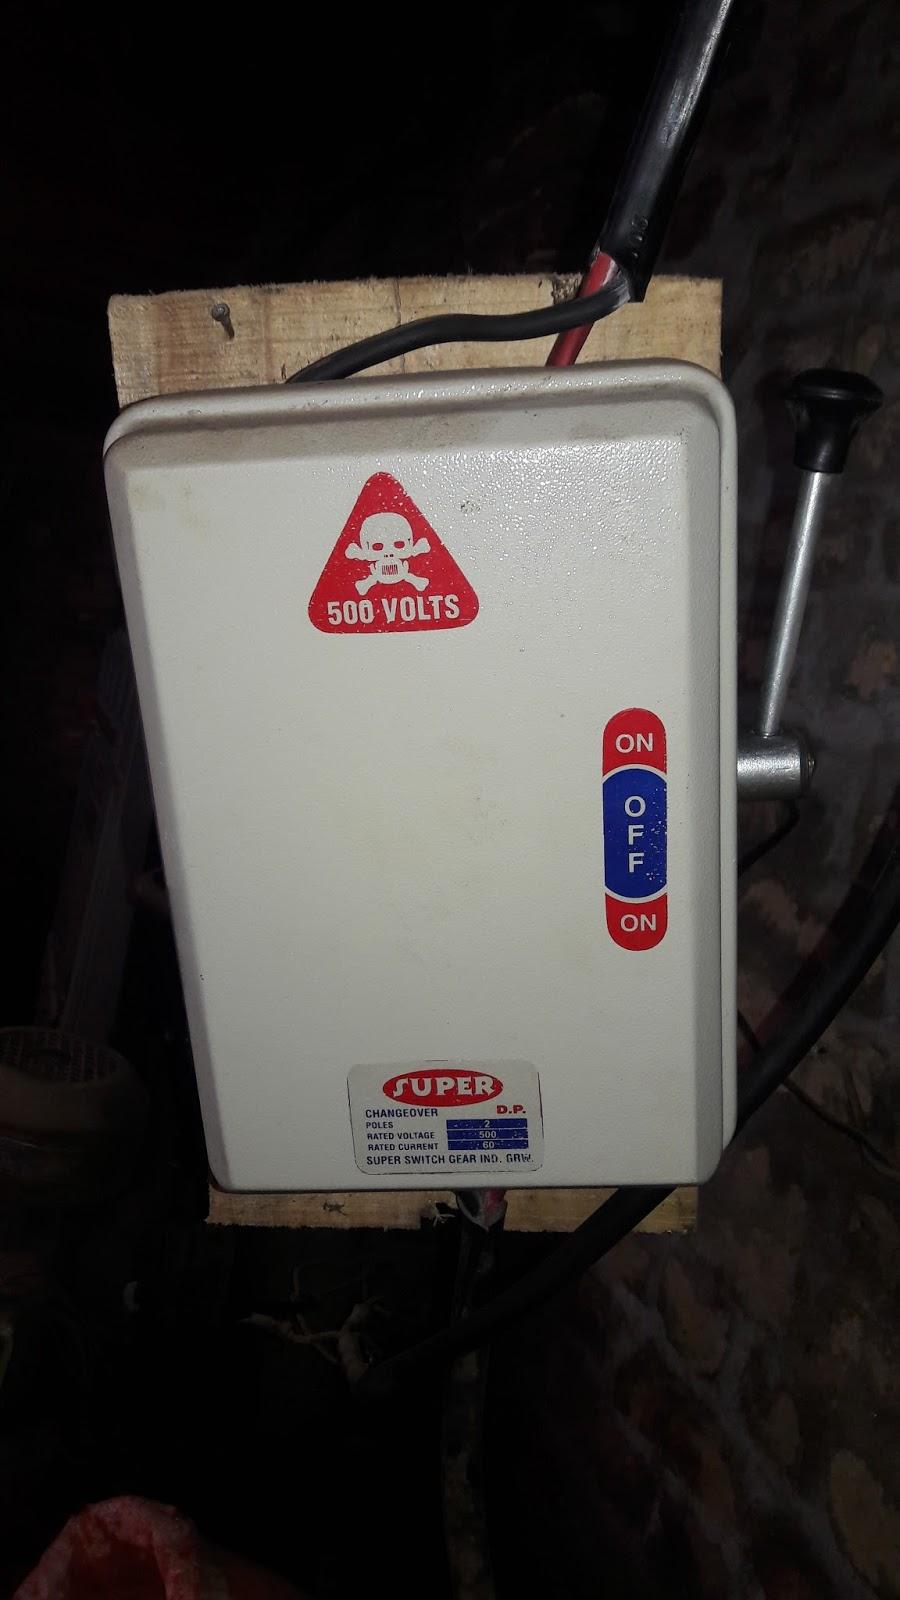 portable generator manual transfer switch wiring diagram stihl 024 av parts changeover - electrical tutorials urdu hindi